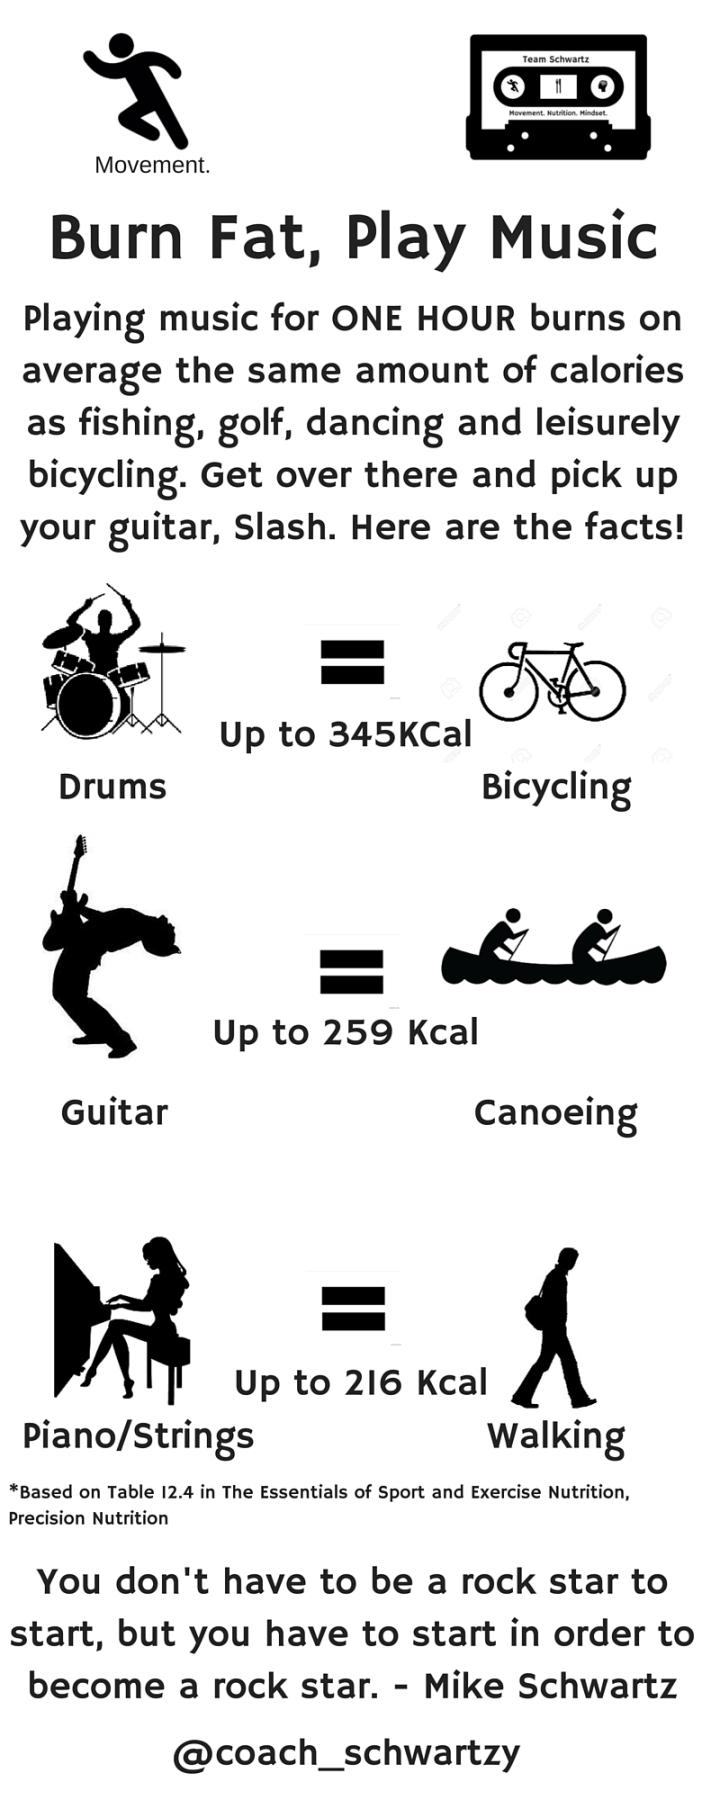 Burn Fat, Play Music